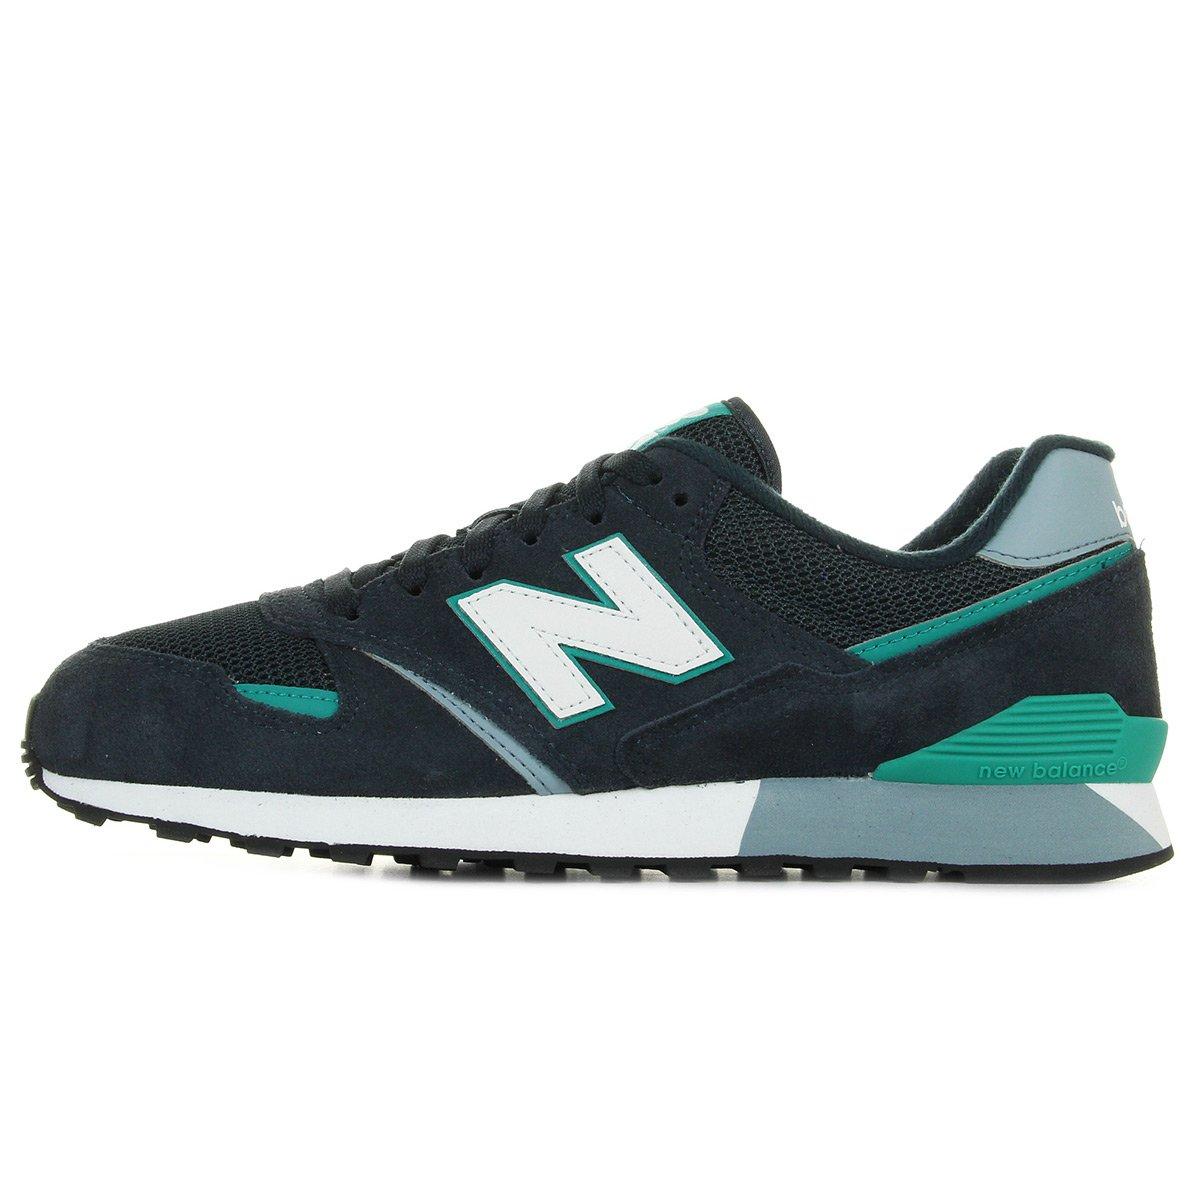 reputable site 5d966 b8f3b New Balance U446 NTG U446NTG, Trainers: Amazon.co.uk: Shoes ...